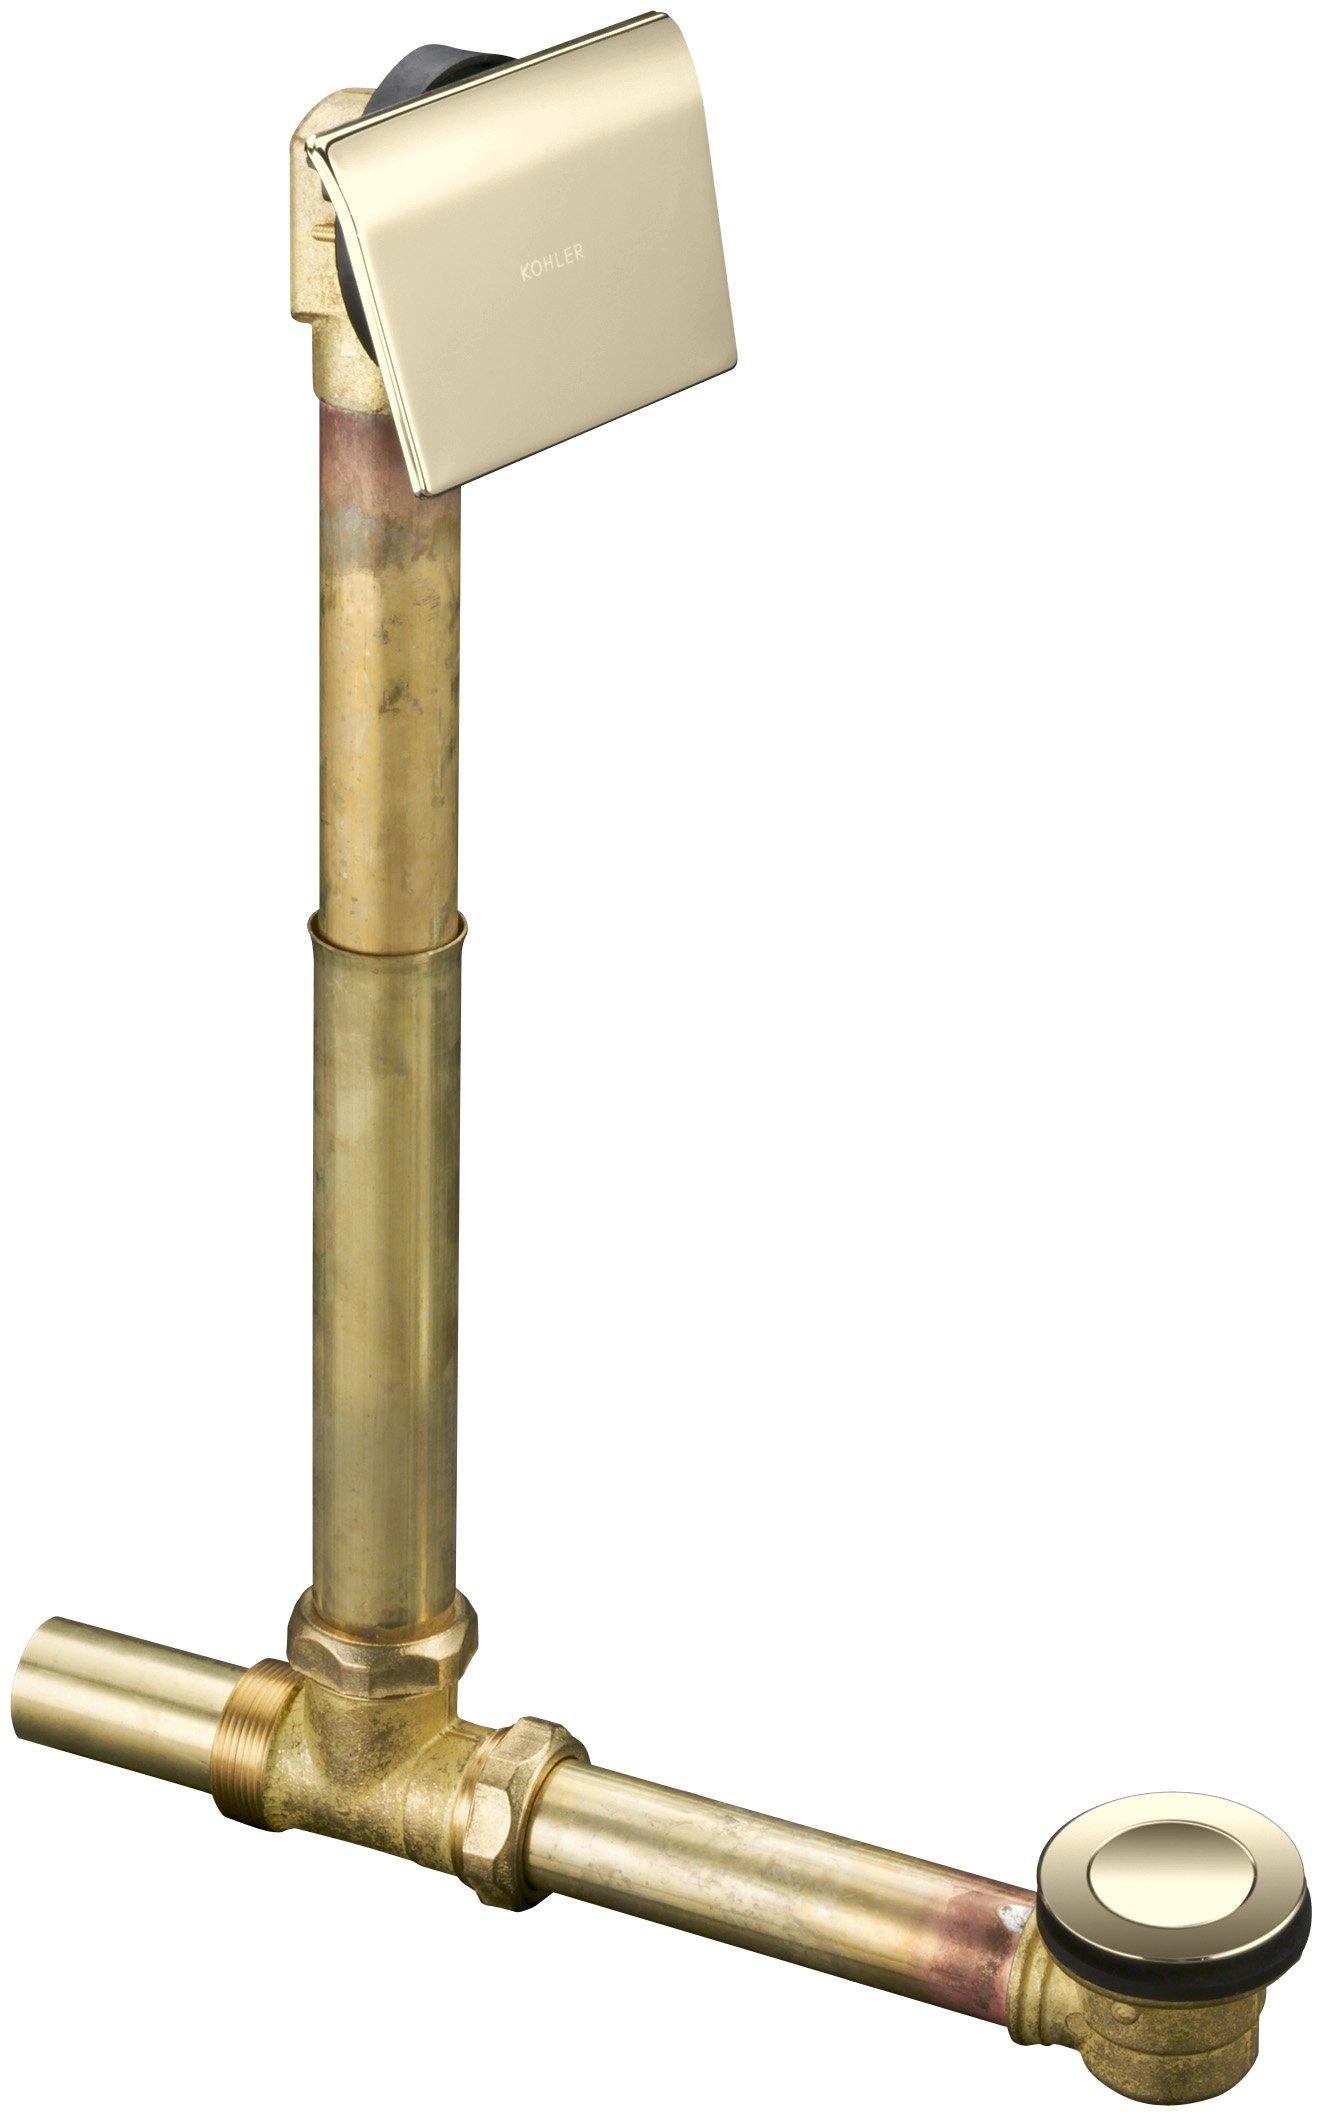 Kohler K-7148-AF-AF Clearflo 1-1/2'' Contoured Pop-Up Drain and Overflow for Above- or Through-The-Floor Installation, Vibrant French Gold by Kohler